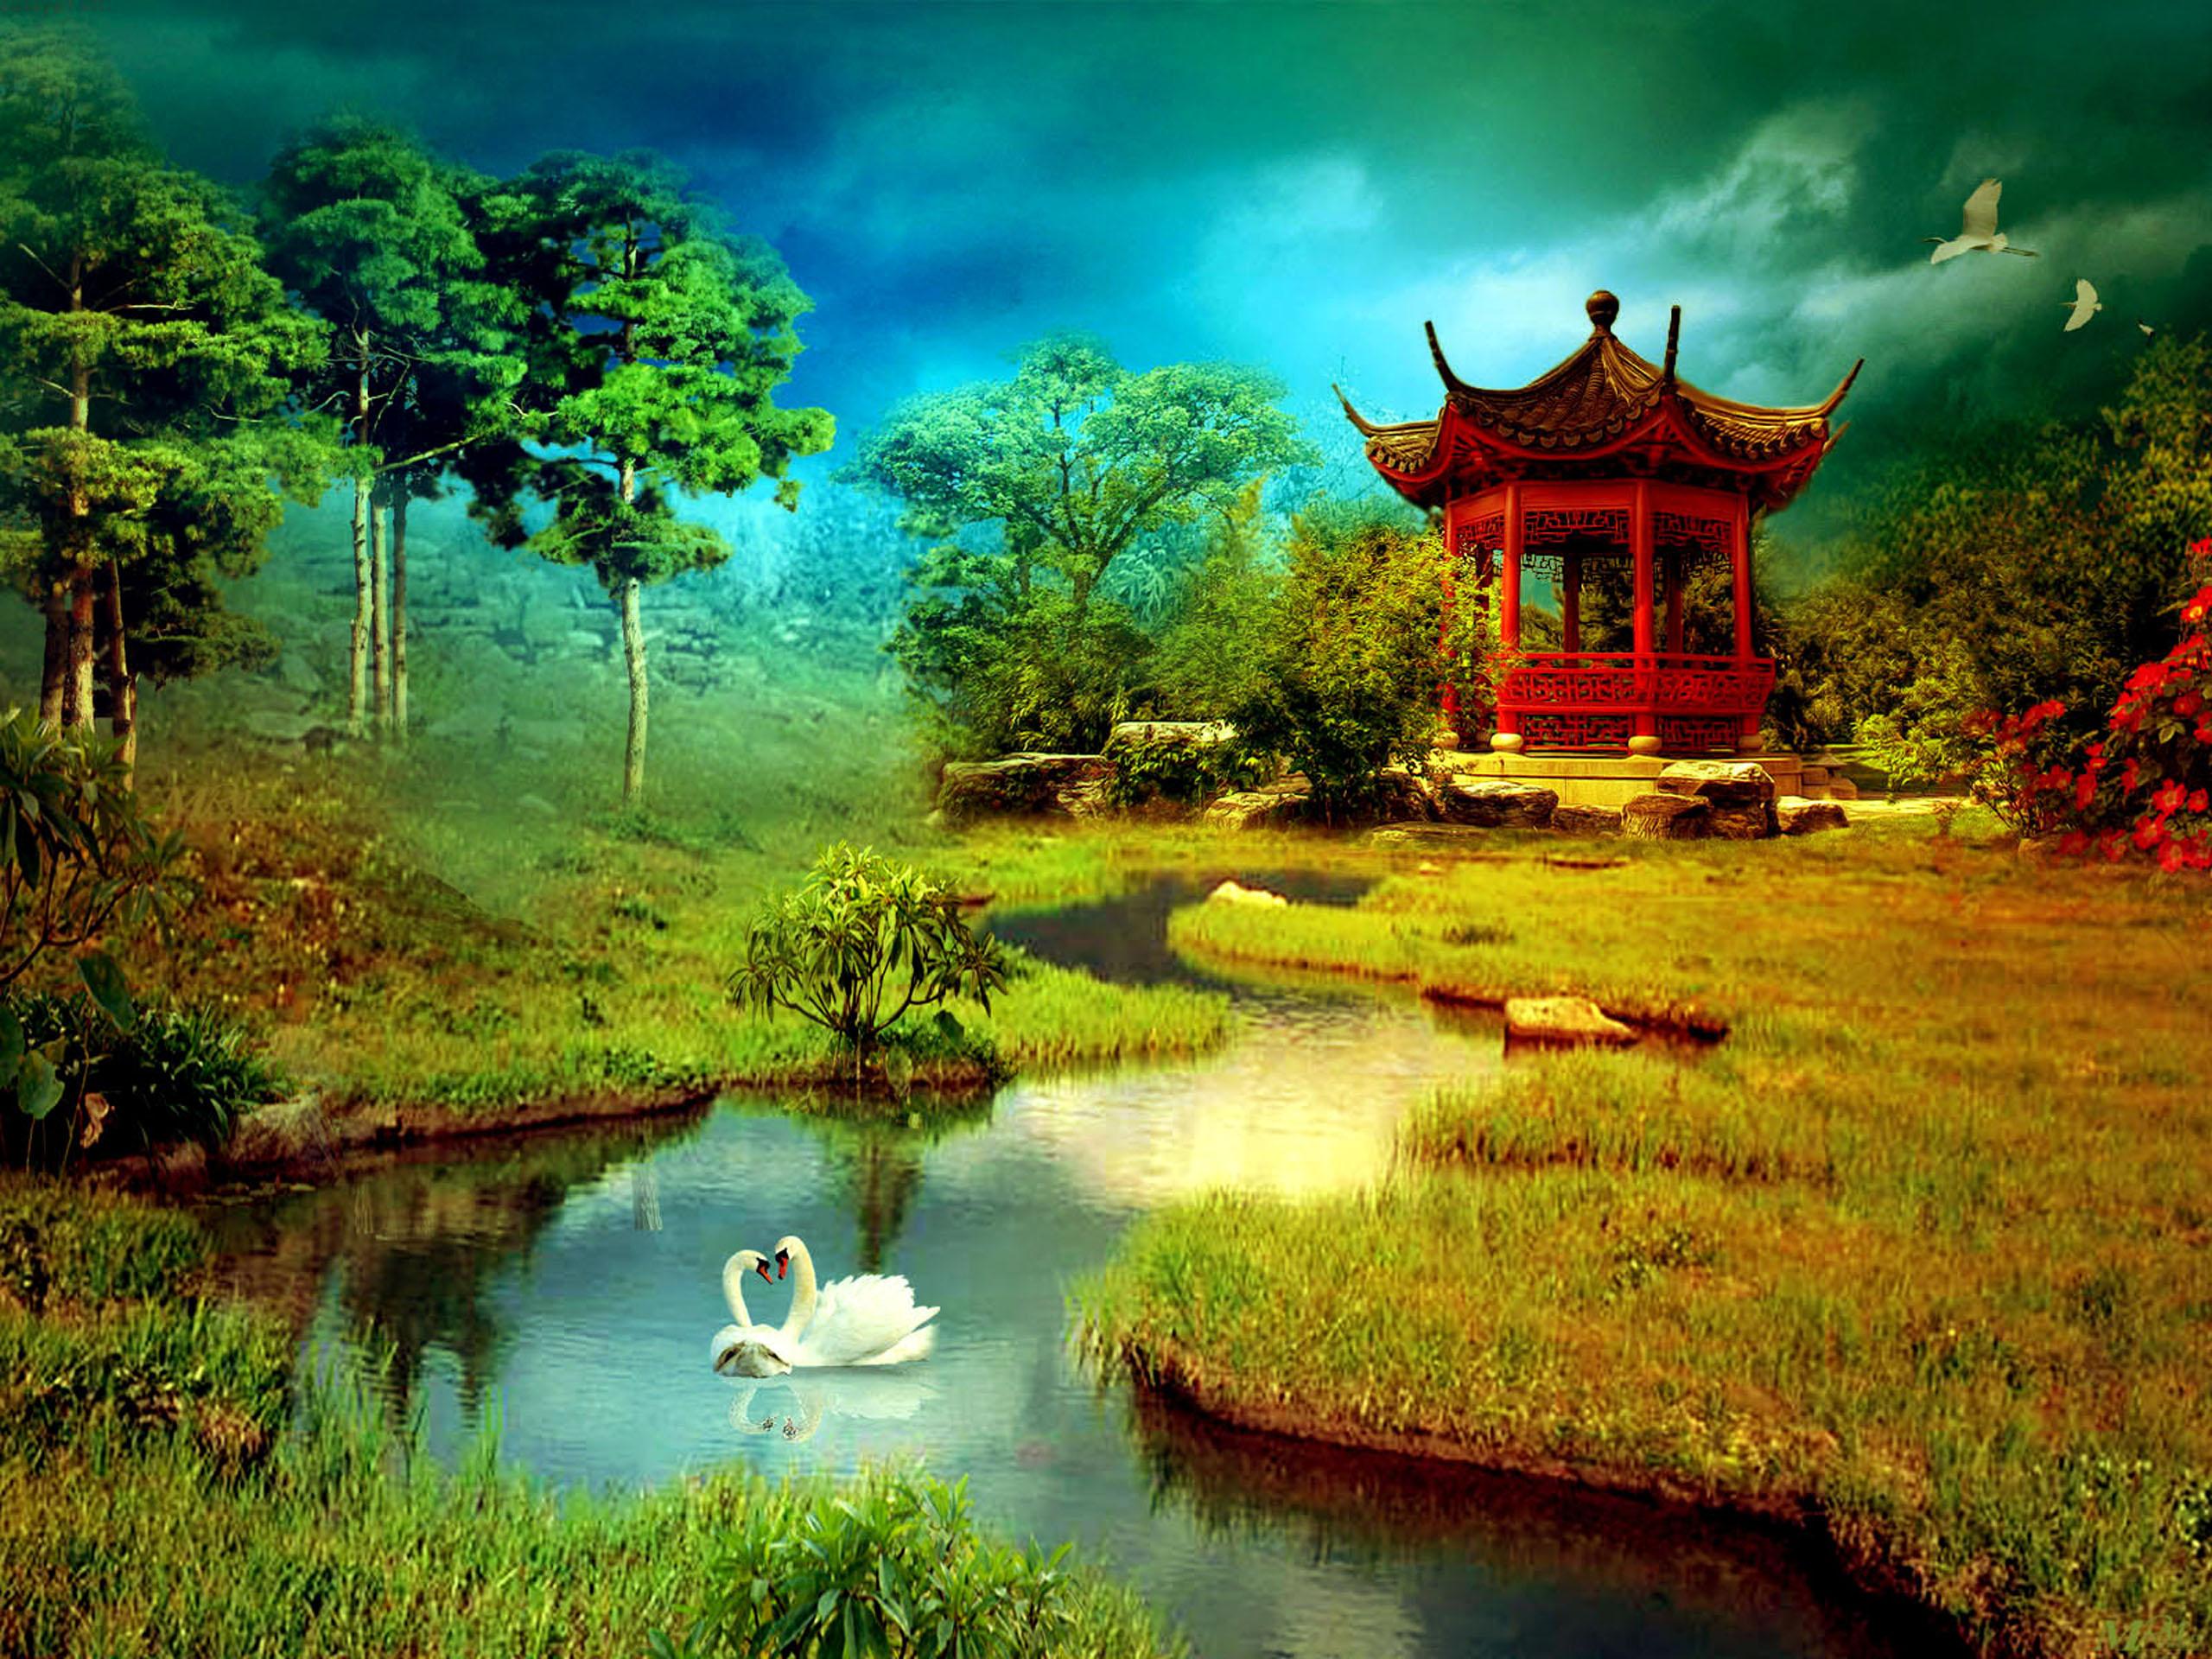 Nature 3d desktop wallpaper   HD Wallpapers 2560x1920